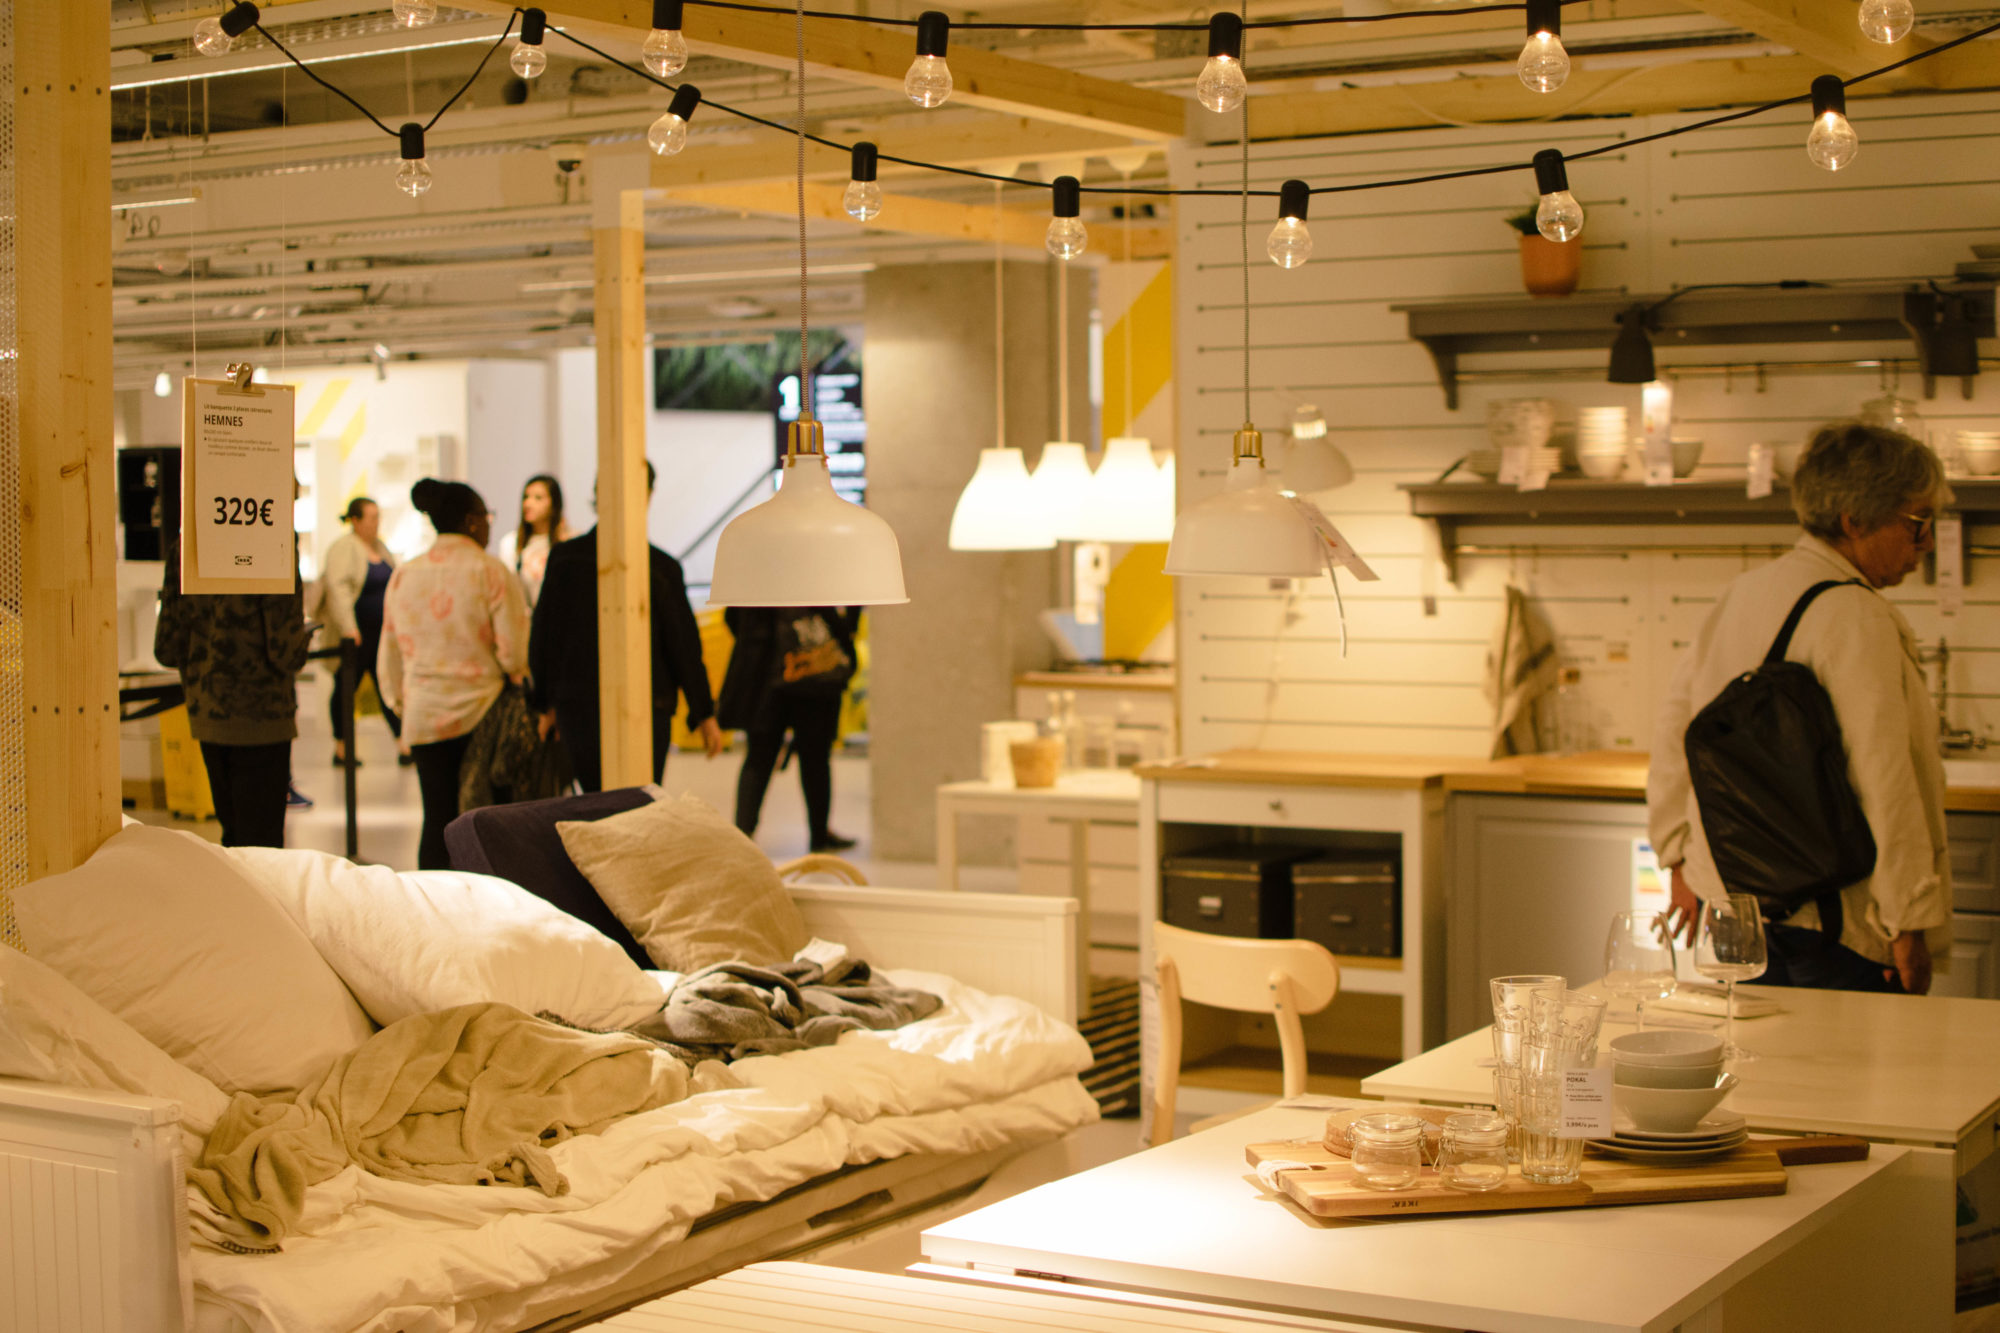 A room display in IKEA Paris La Madeleine called L'art de recevoir dans 26m²